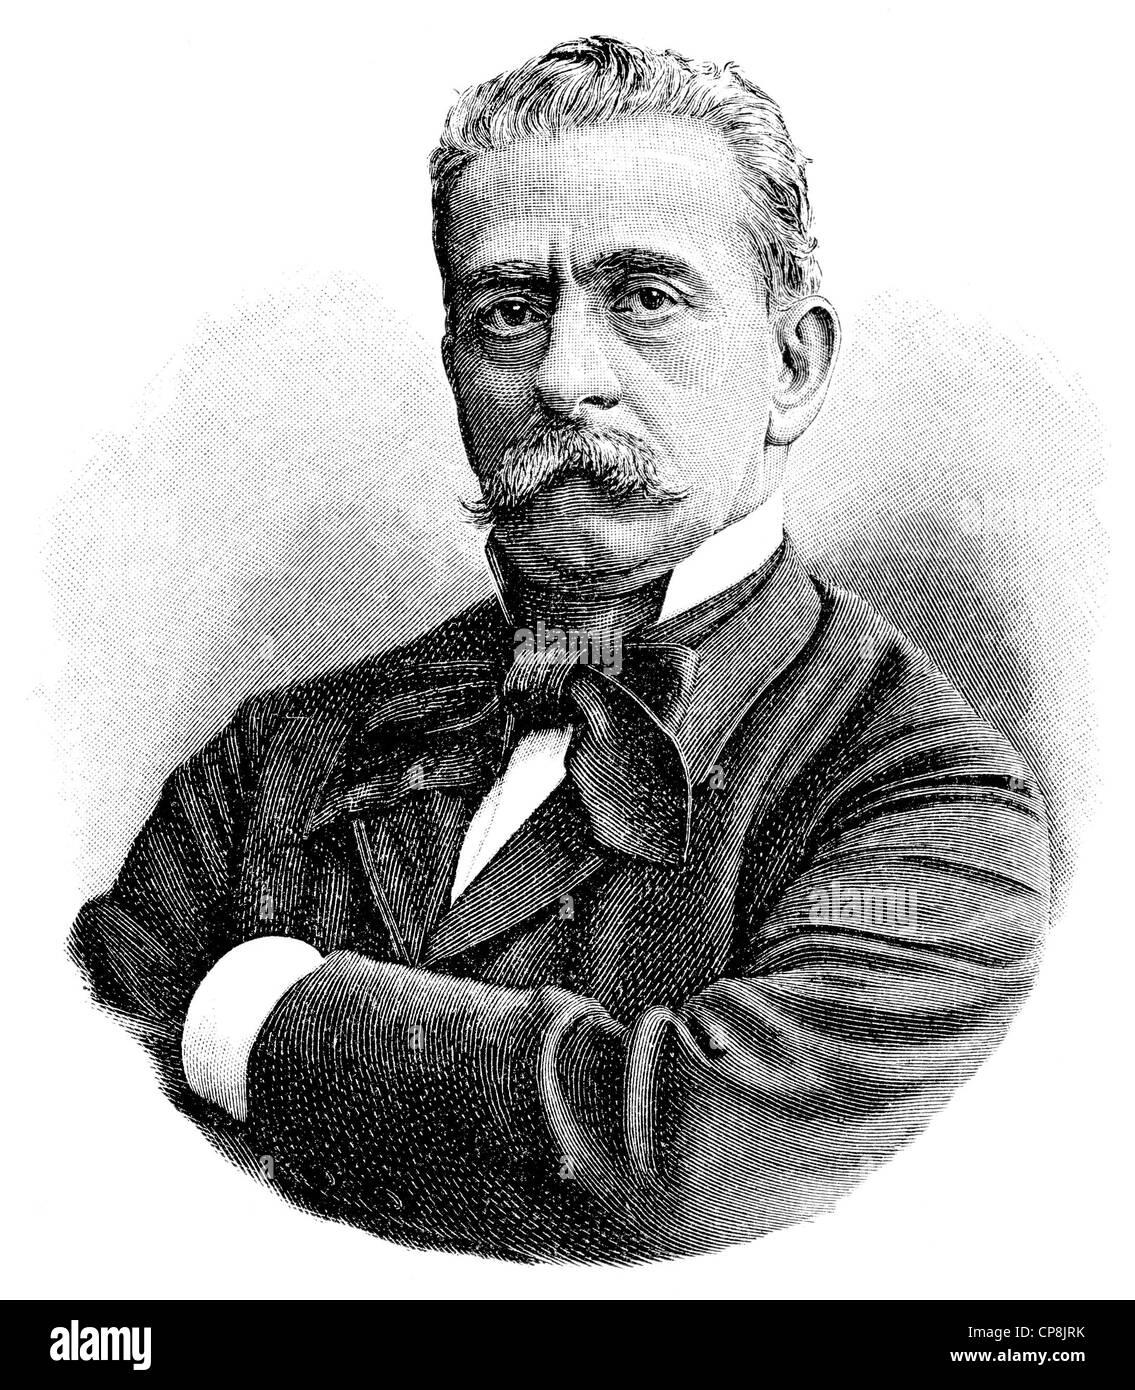 Paolo Ferrari 1822 1889 An Italian Comedy Writer Historische Stock Photo Alamy